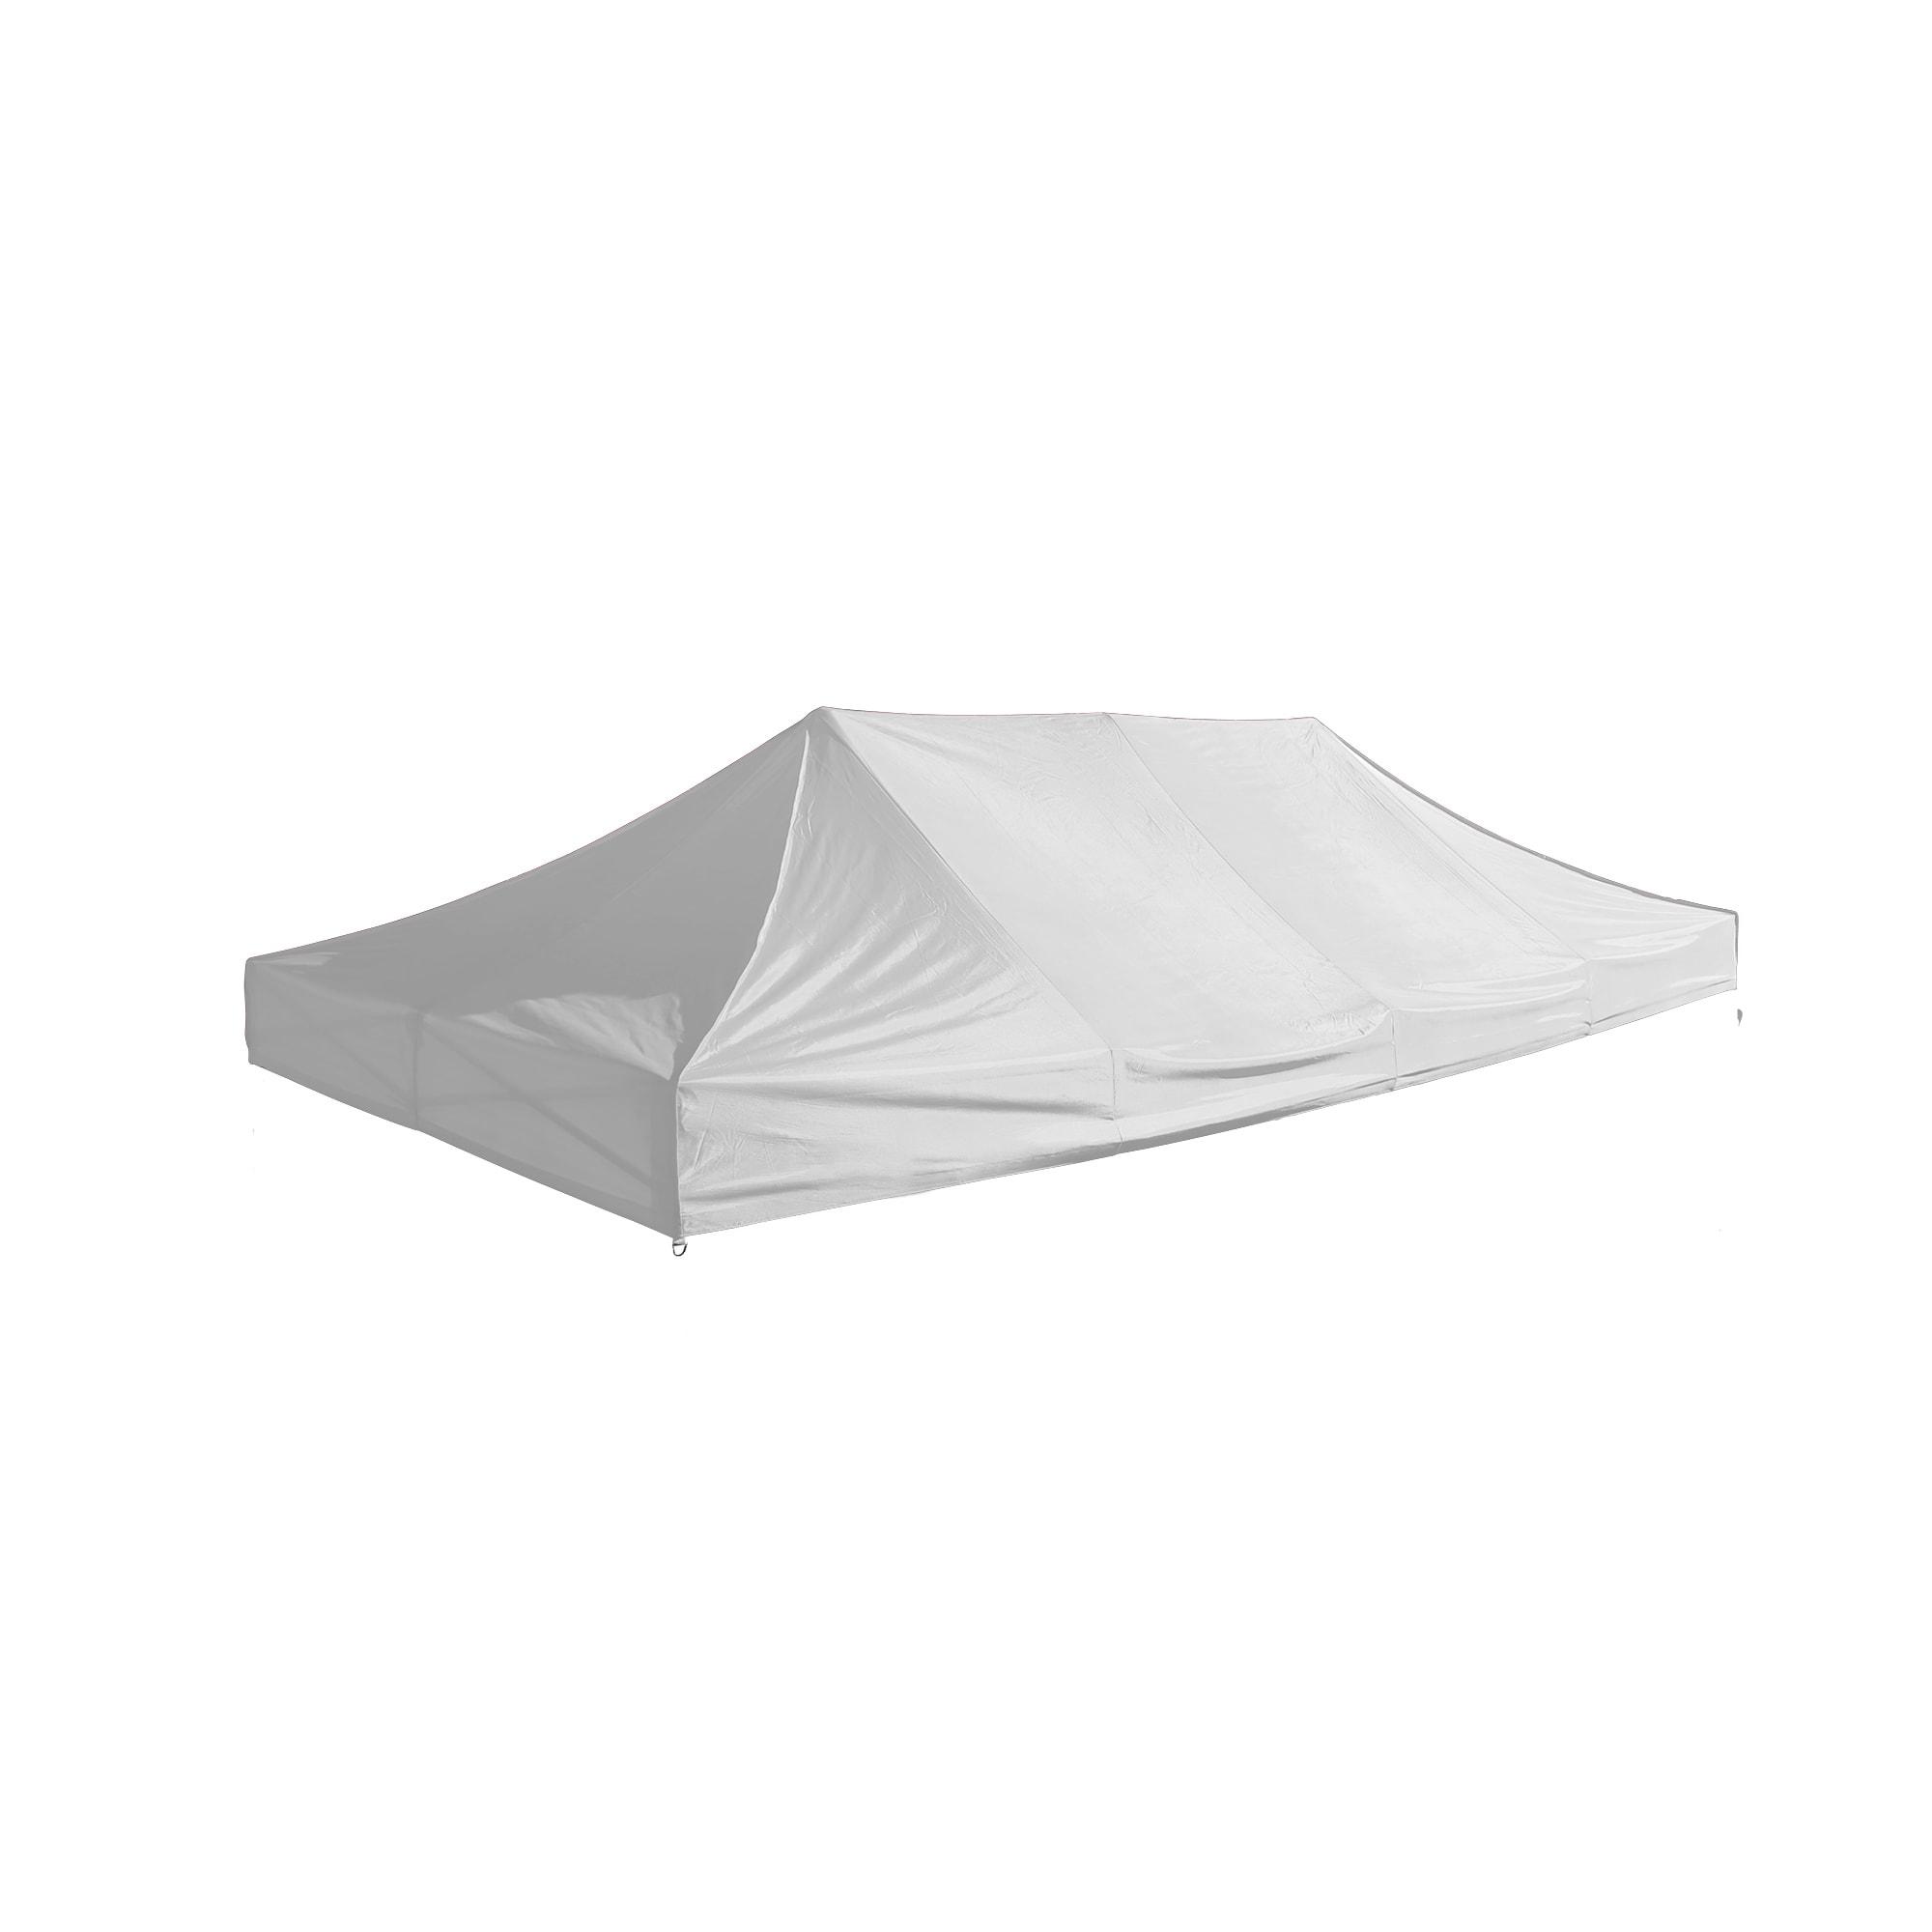 ersatzdach pavillon dach wasserdicht 3x3m 4x4m 3x6m 4x8m paramondo pro 30 40 ebay. Black Bedroom Furniture Sets. Home Design Ideas